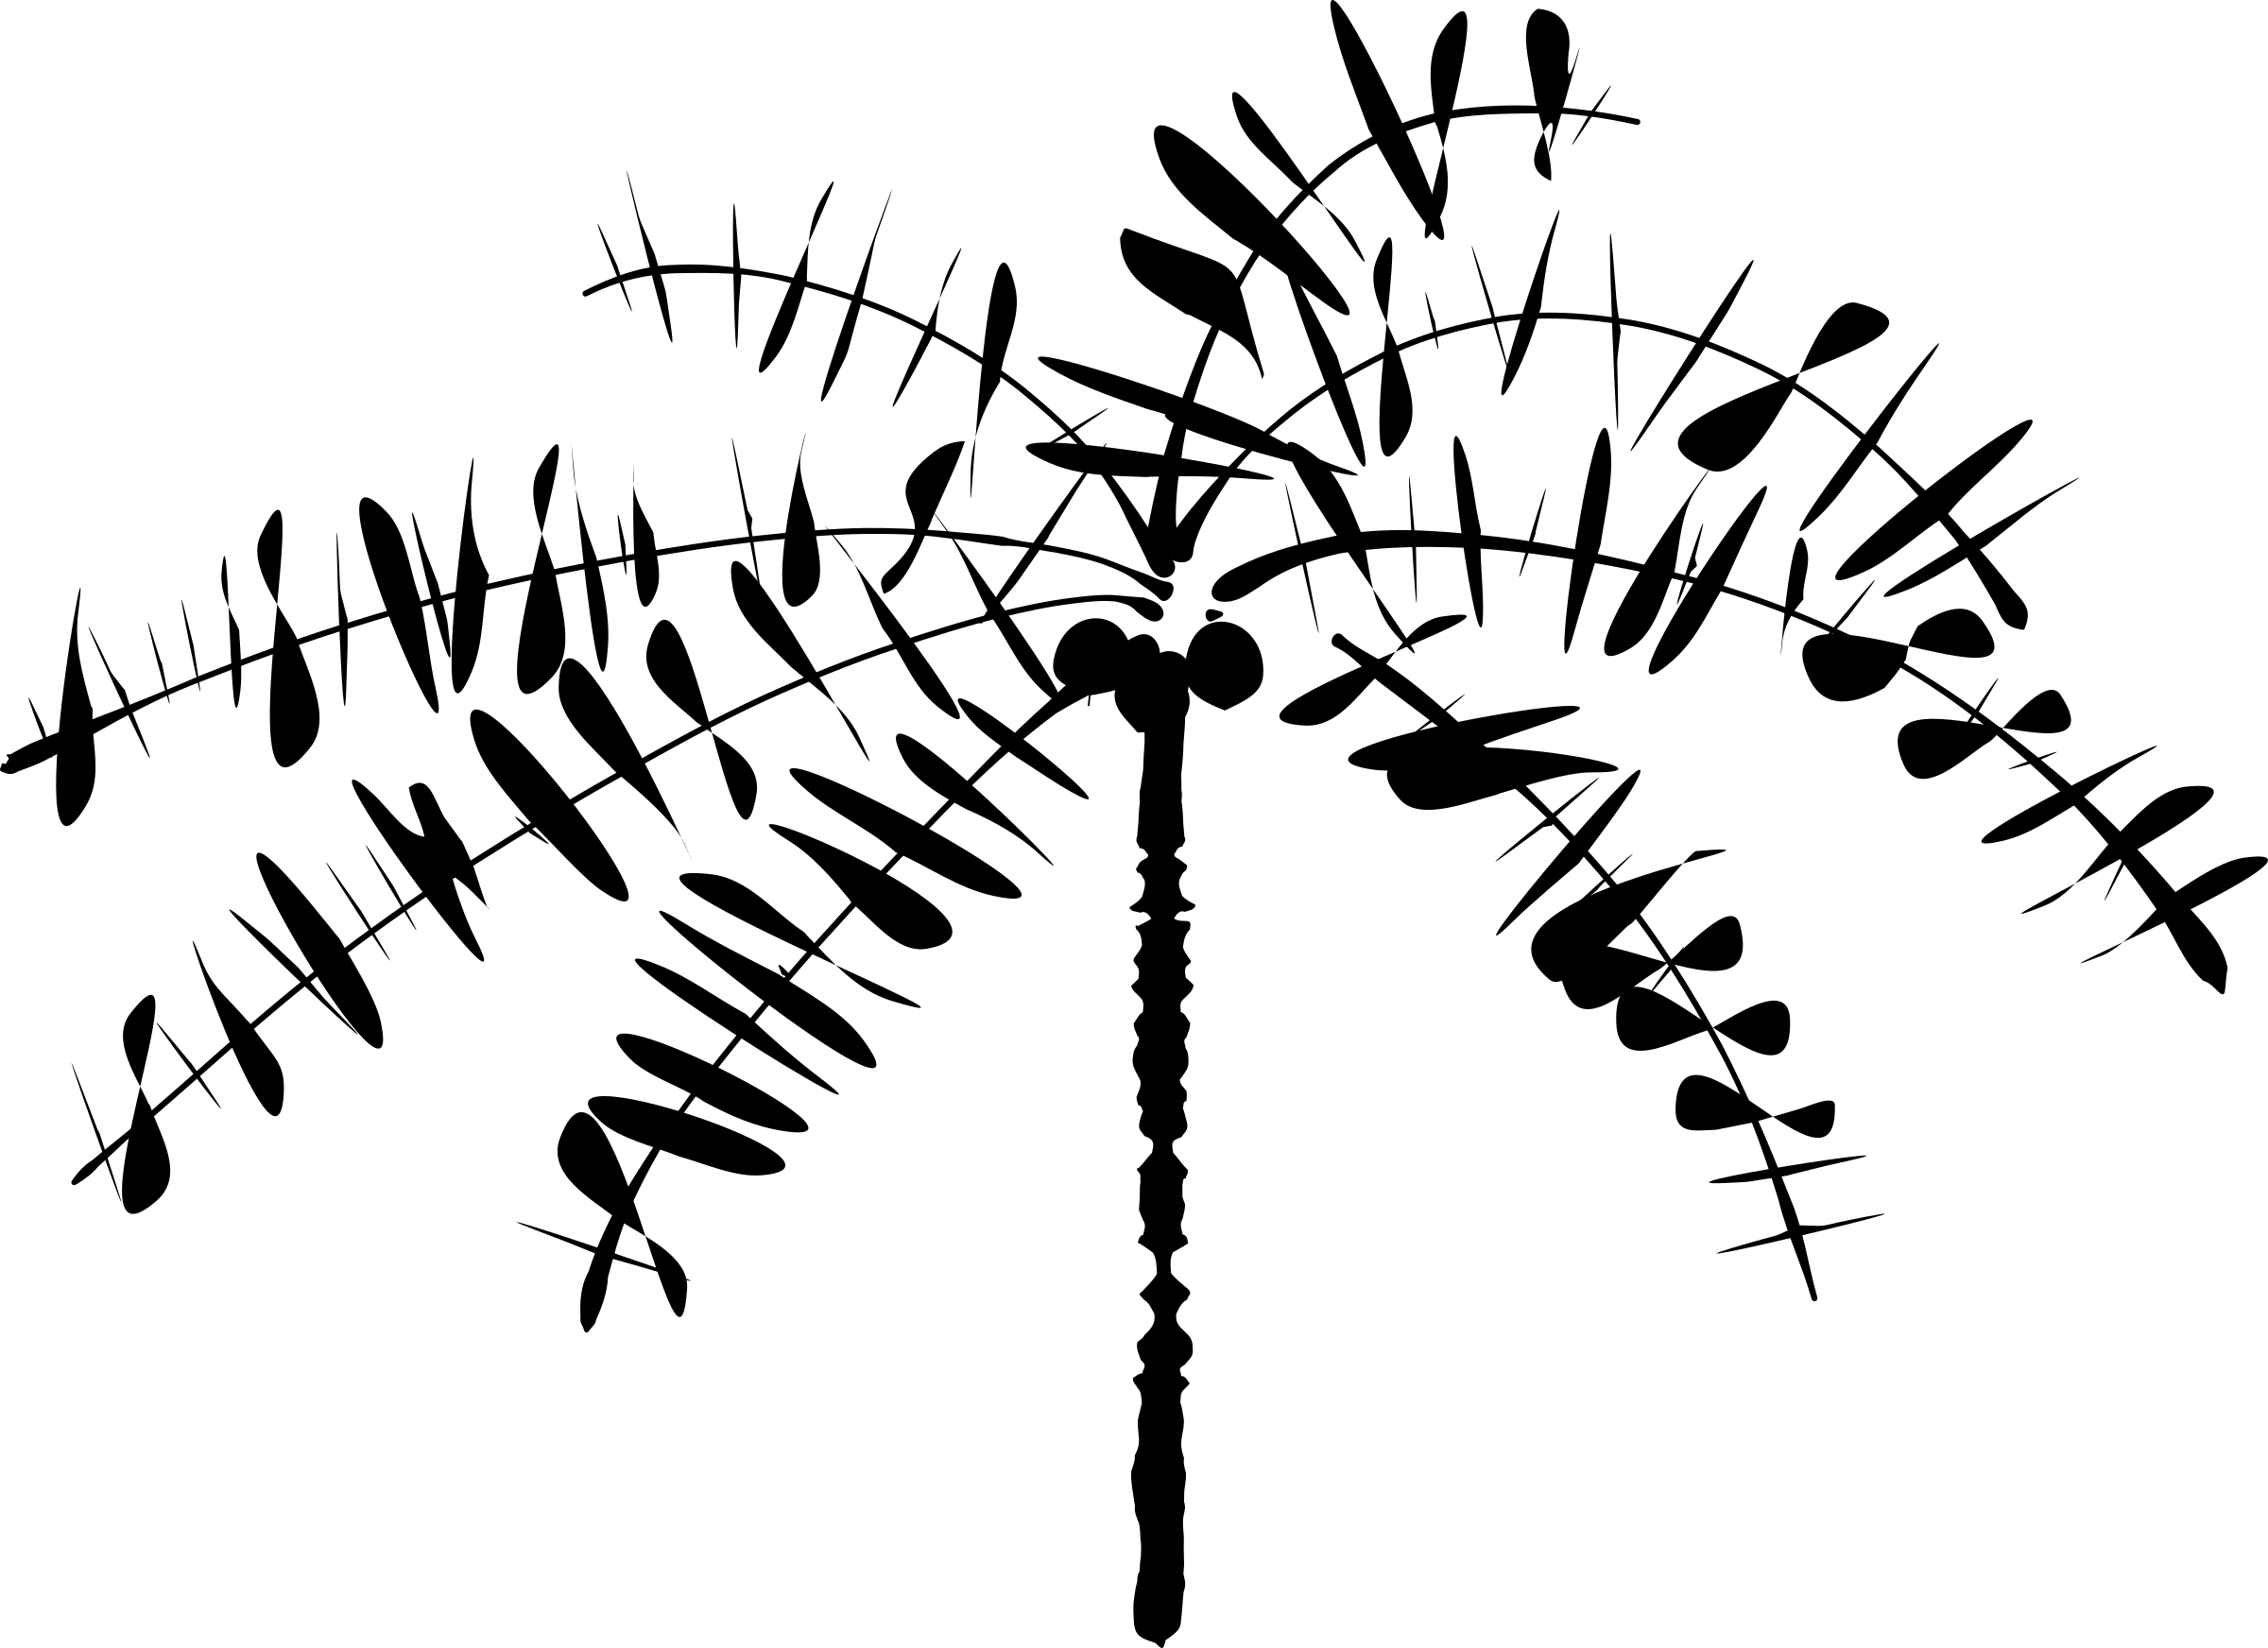 2400x1744 Clipart